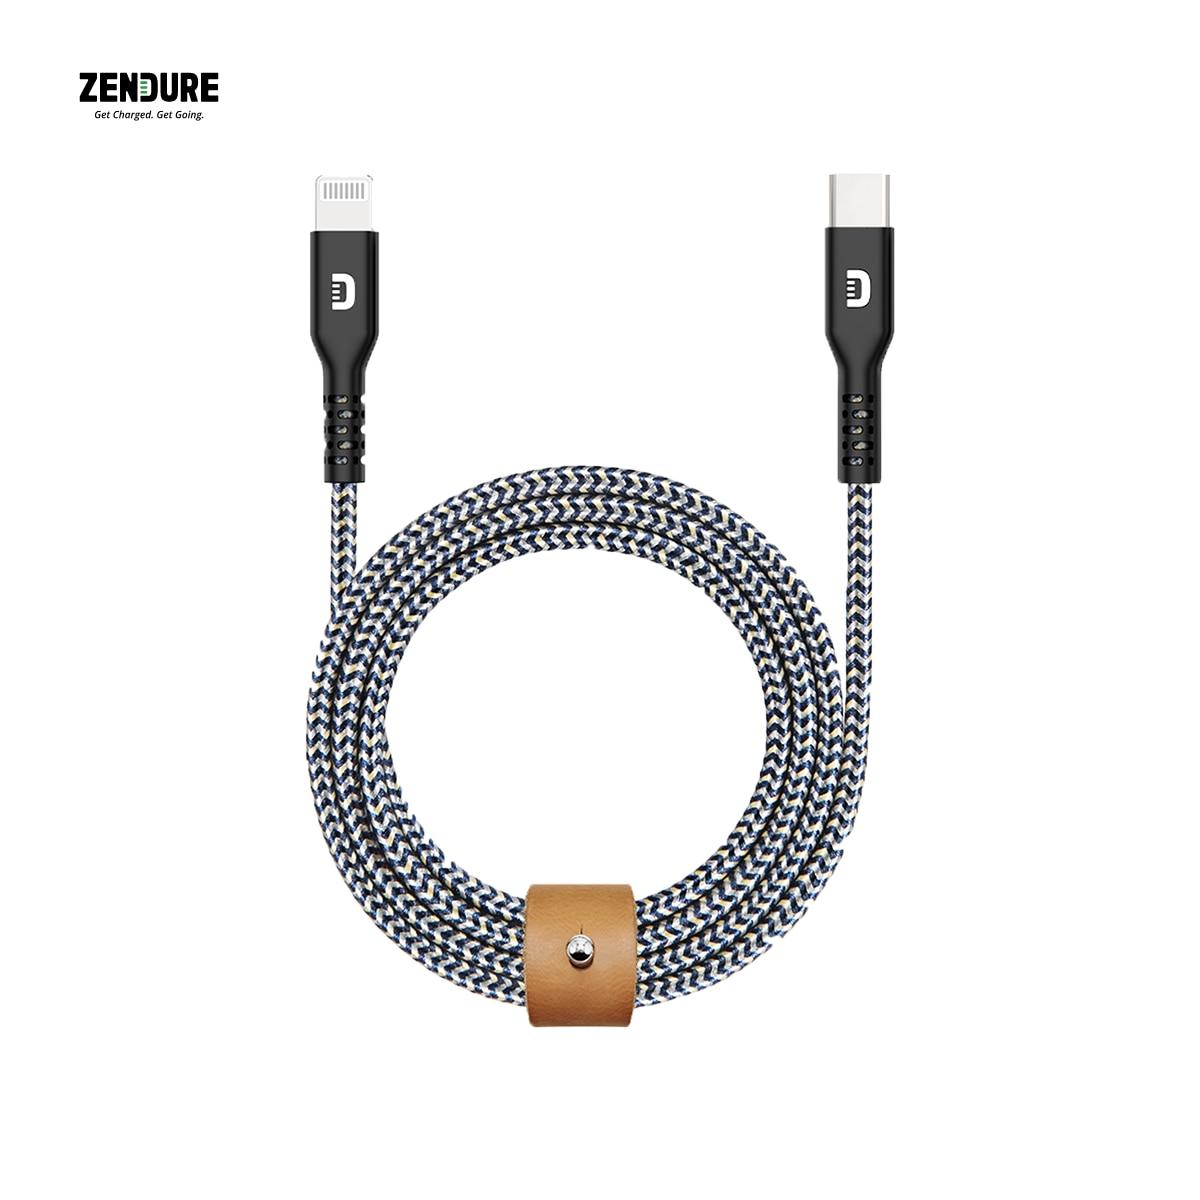 ZENDURE SuperCord USB-C إلى البرق 1m كابل CTL أبل MFi المعتمدة جدا قوي ودائم مع النايلون و كيفلر مضفر